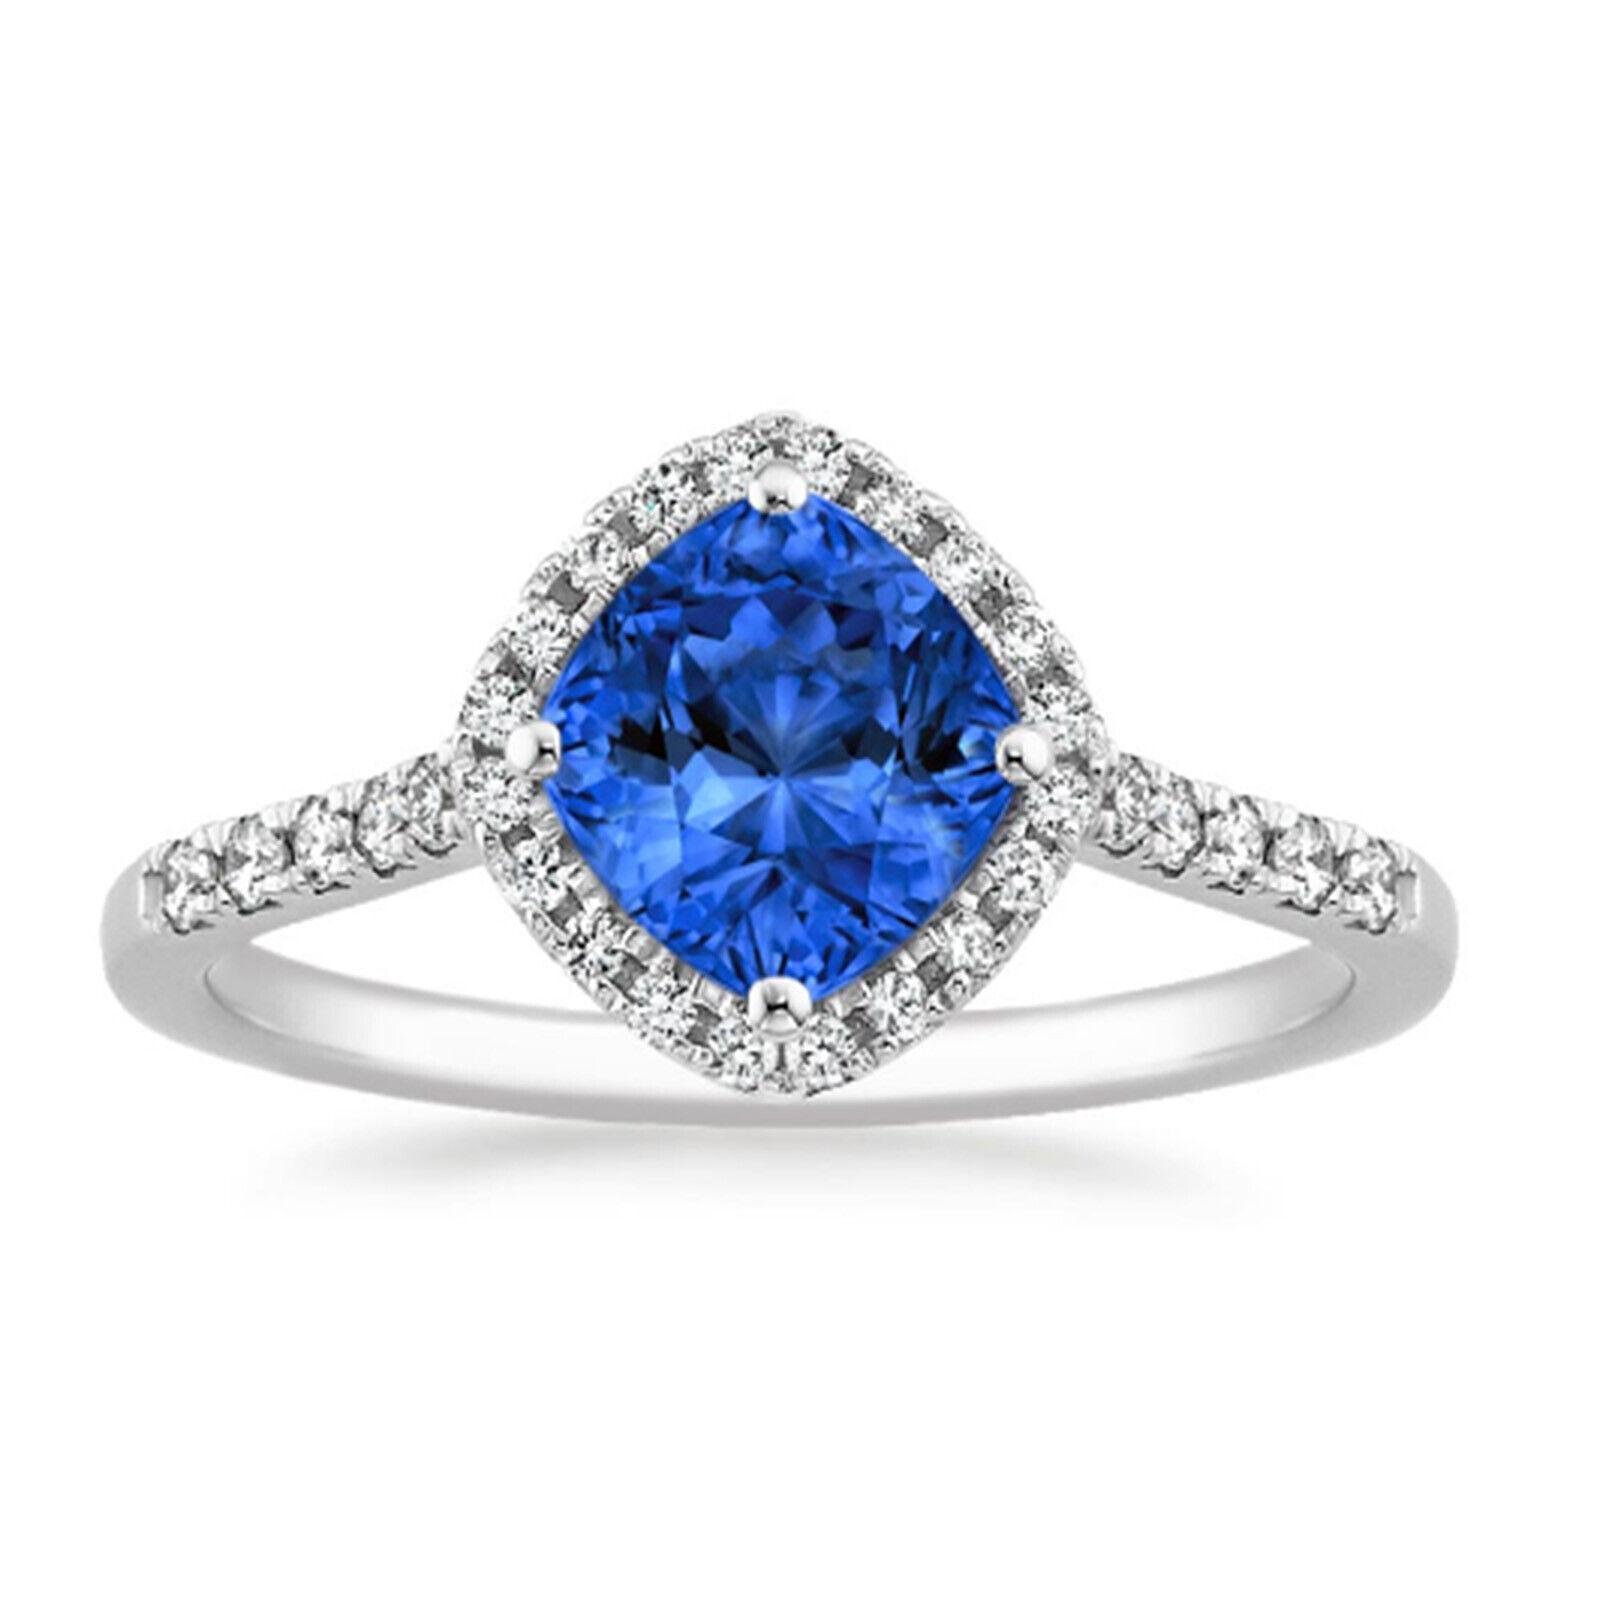 1.40 Ct Cushion Genuine Sapphire Diamond Wedding Ring 14K White gold Size 7.5 8